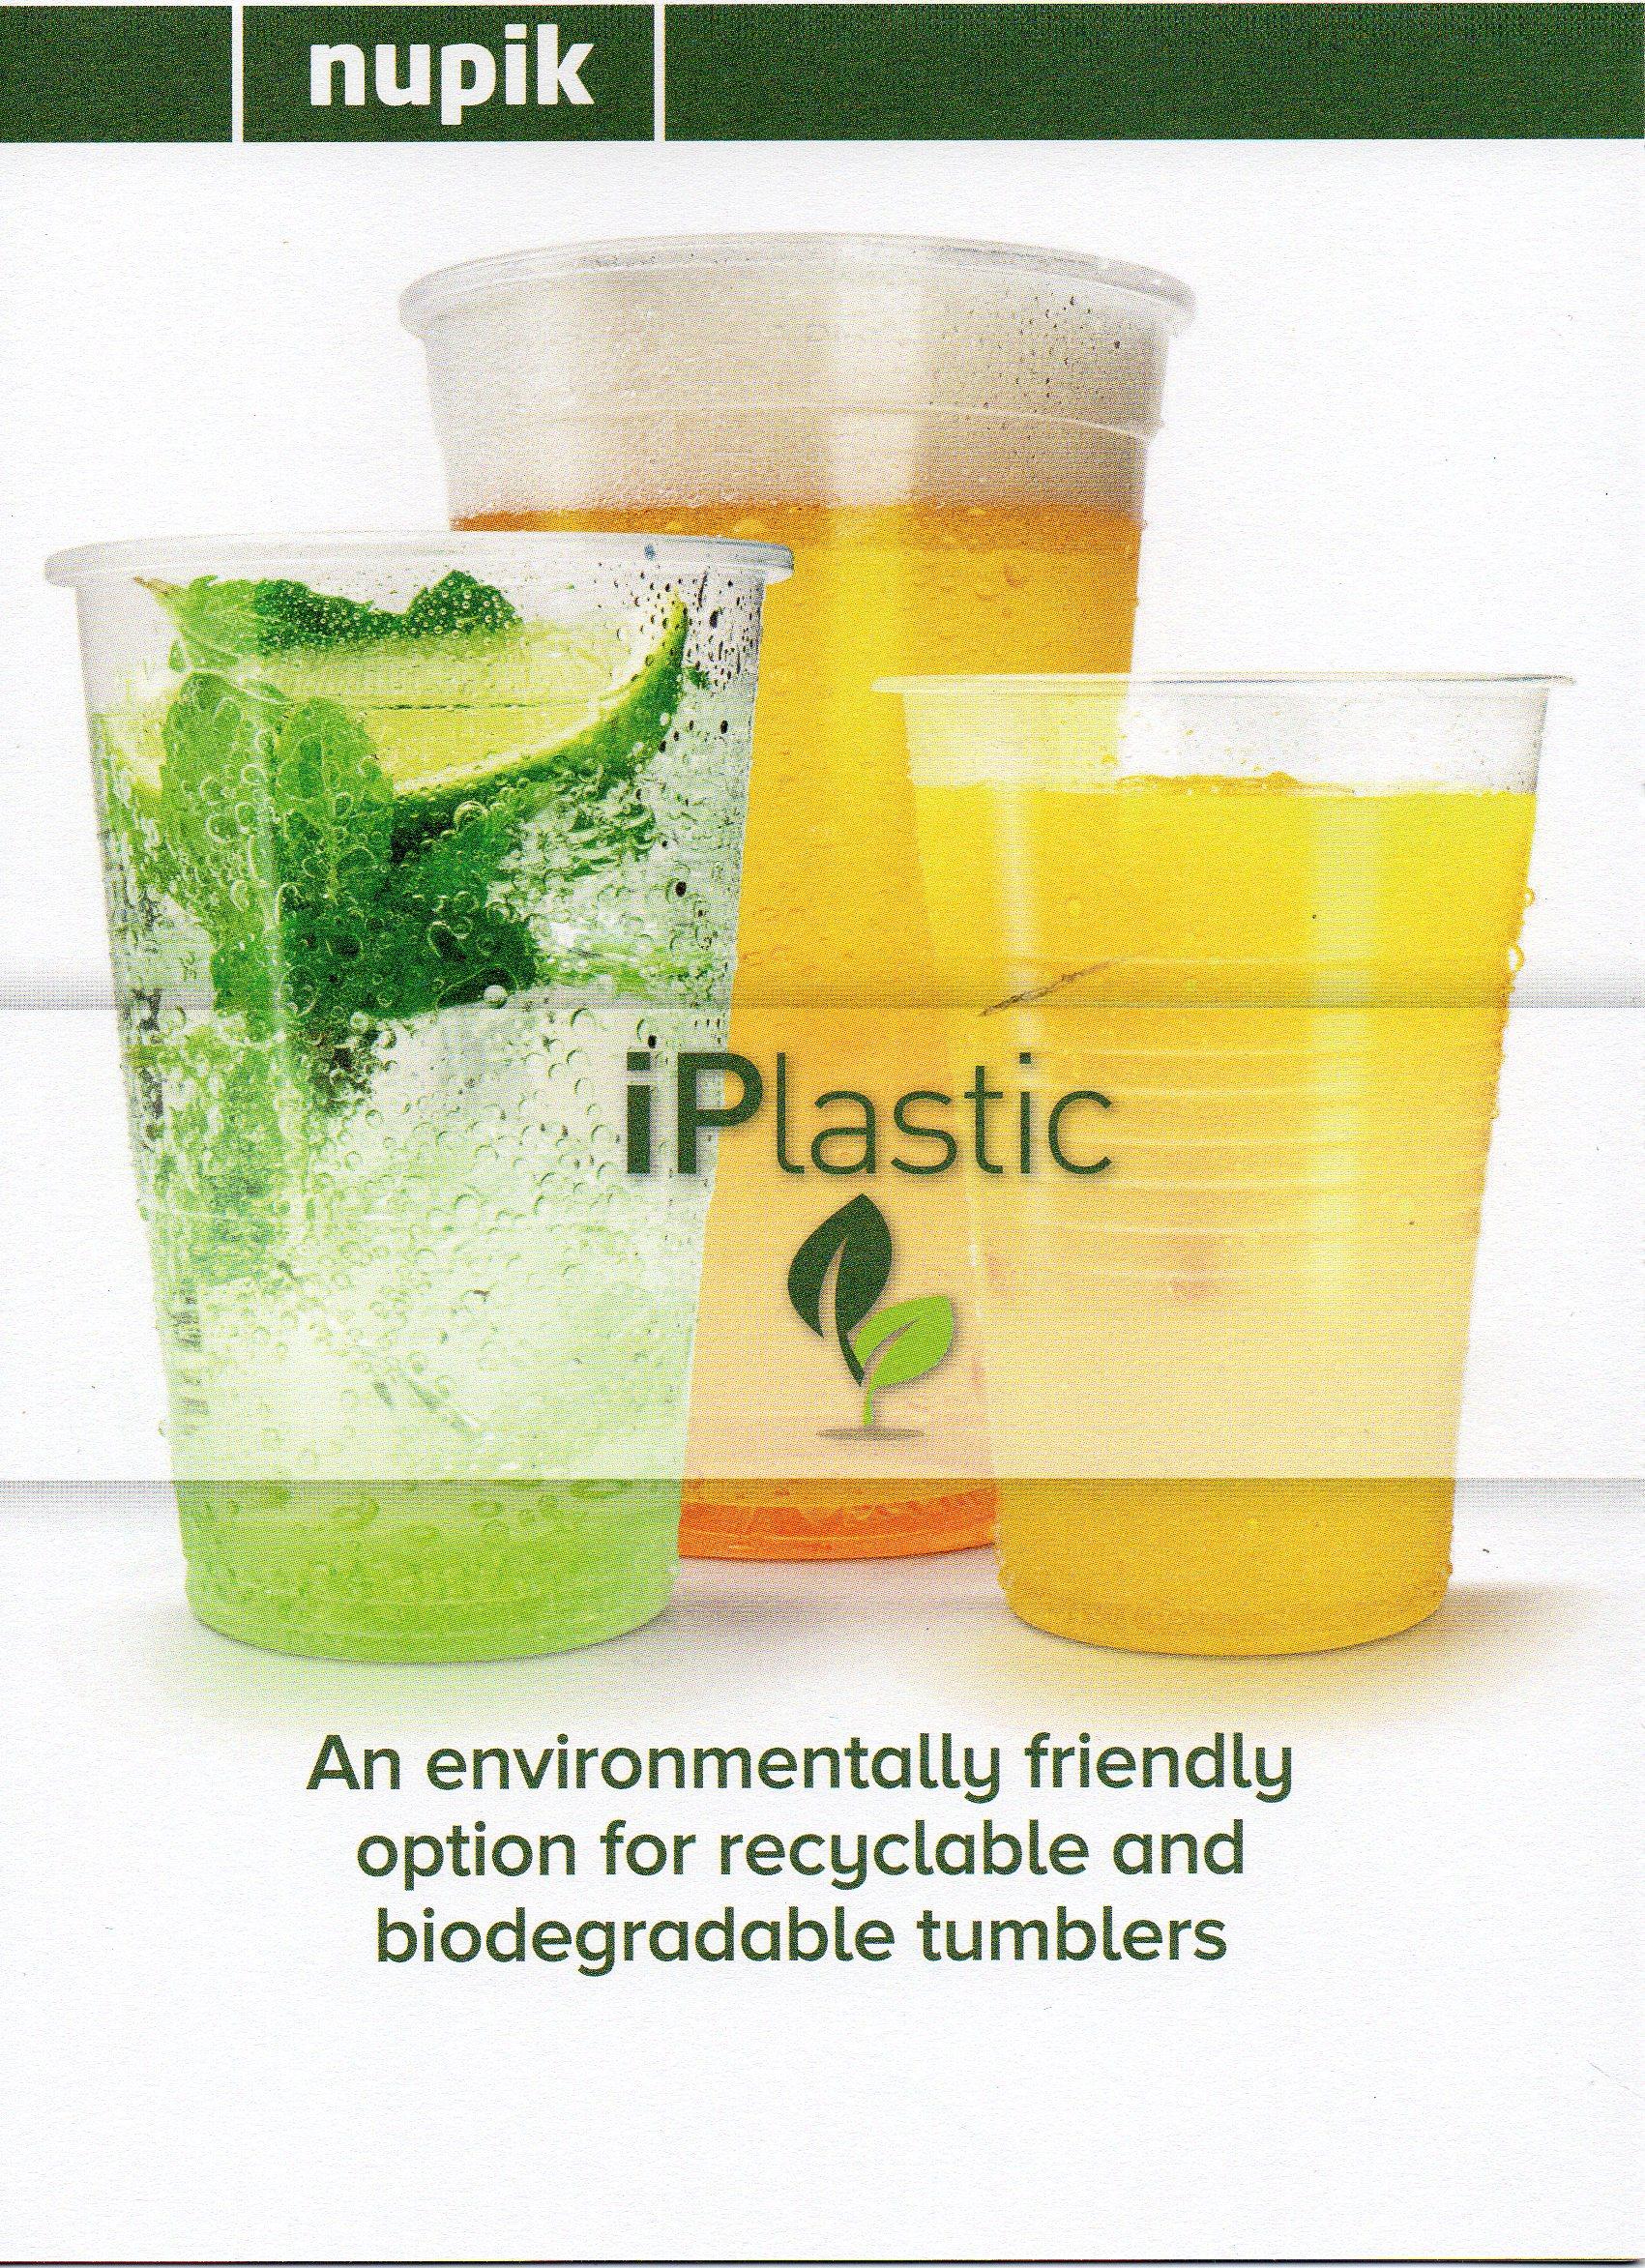 iPlastic is an exclusive Nupik brand.